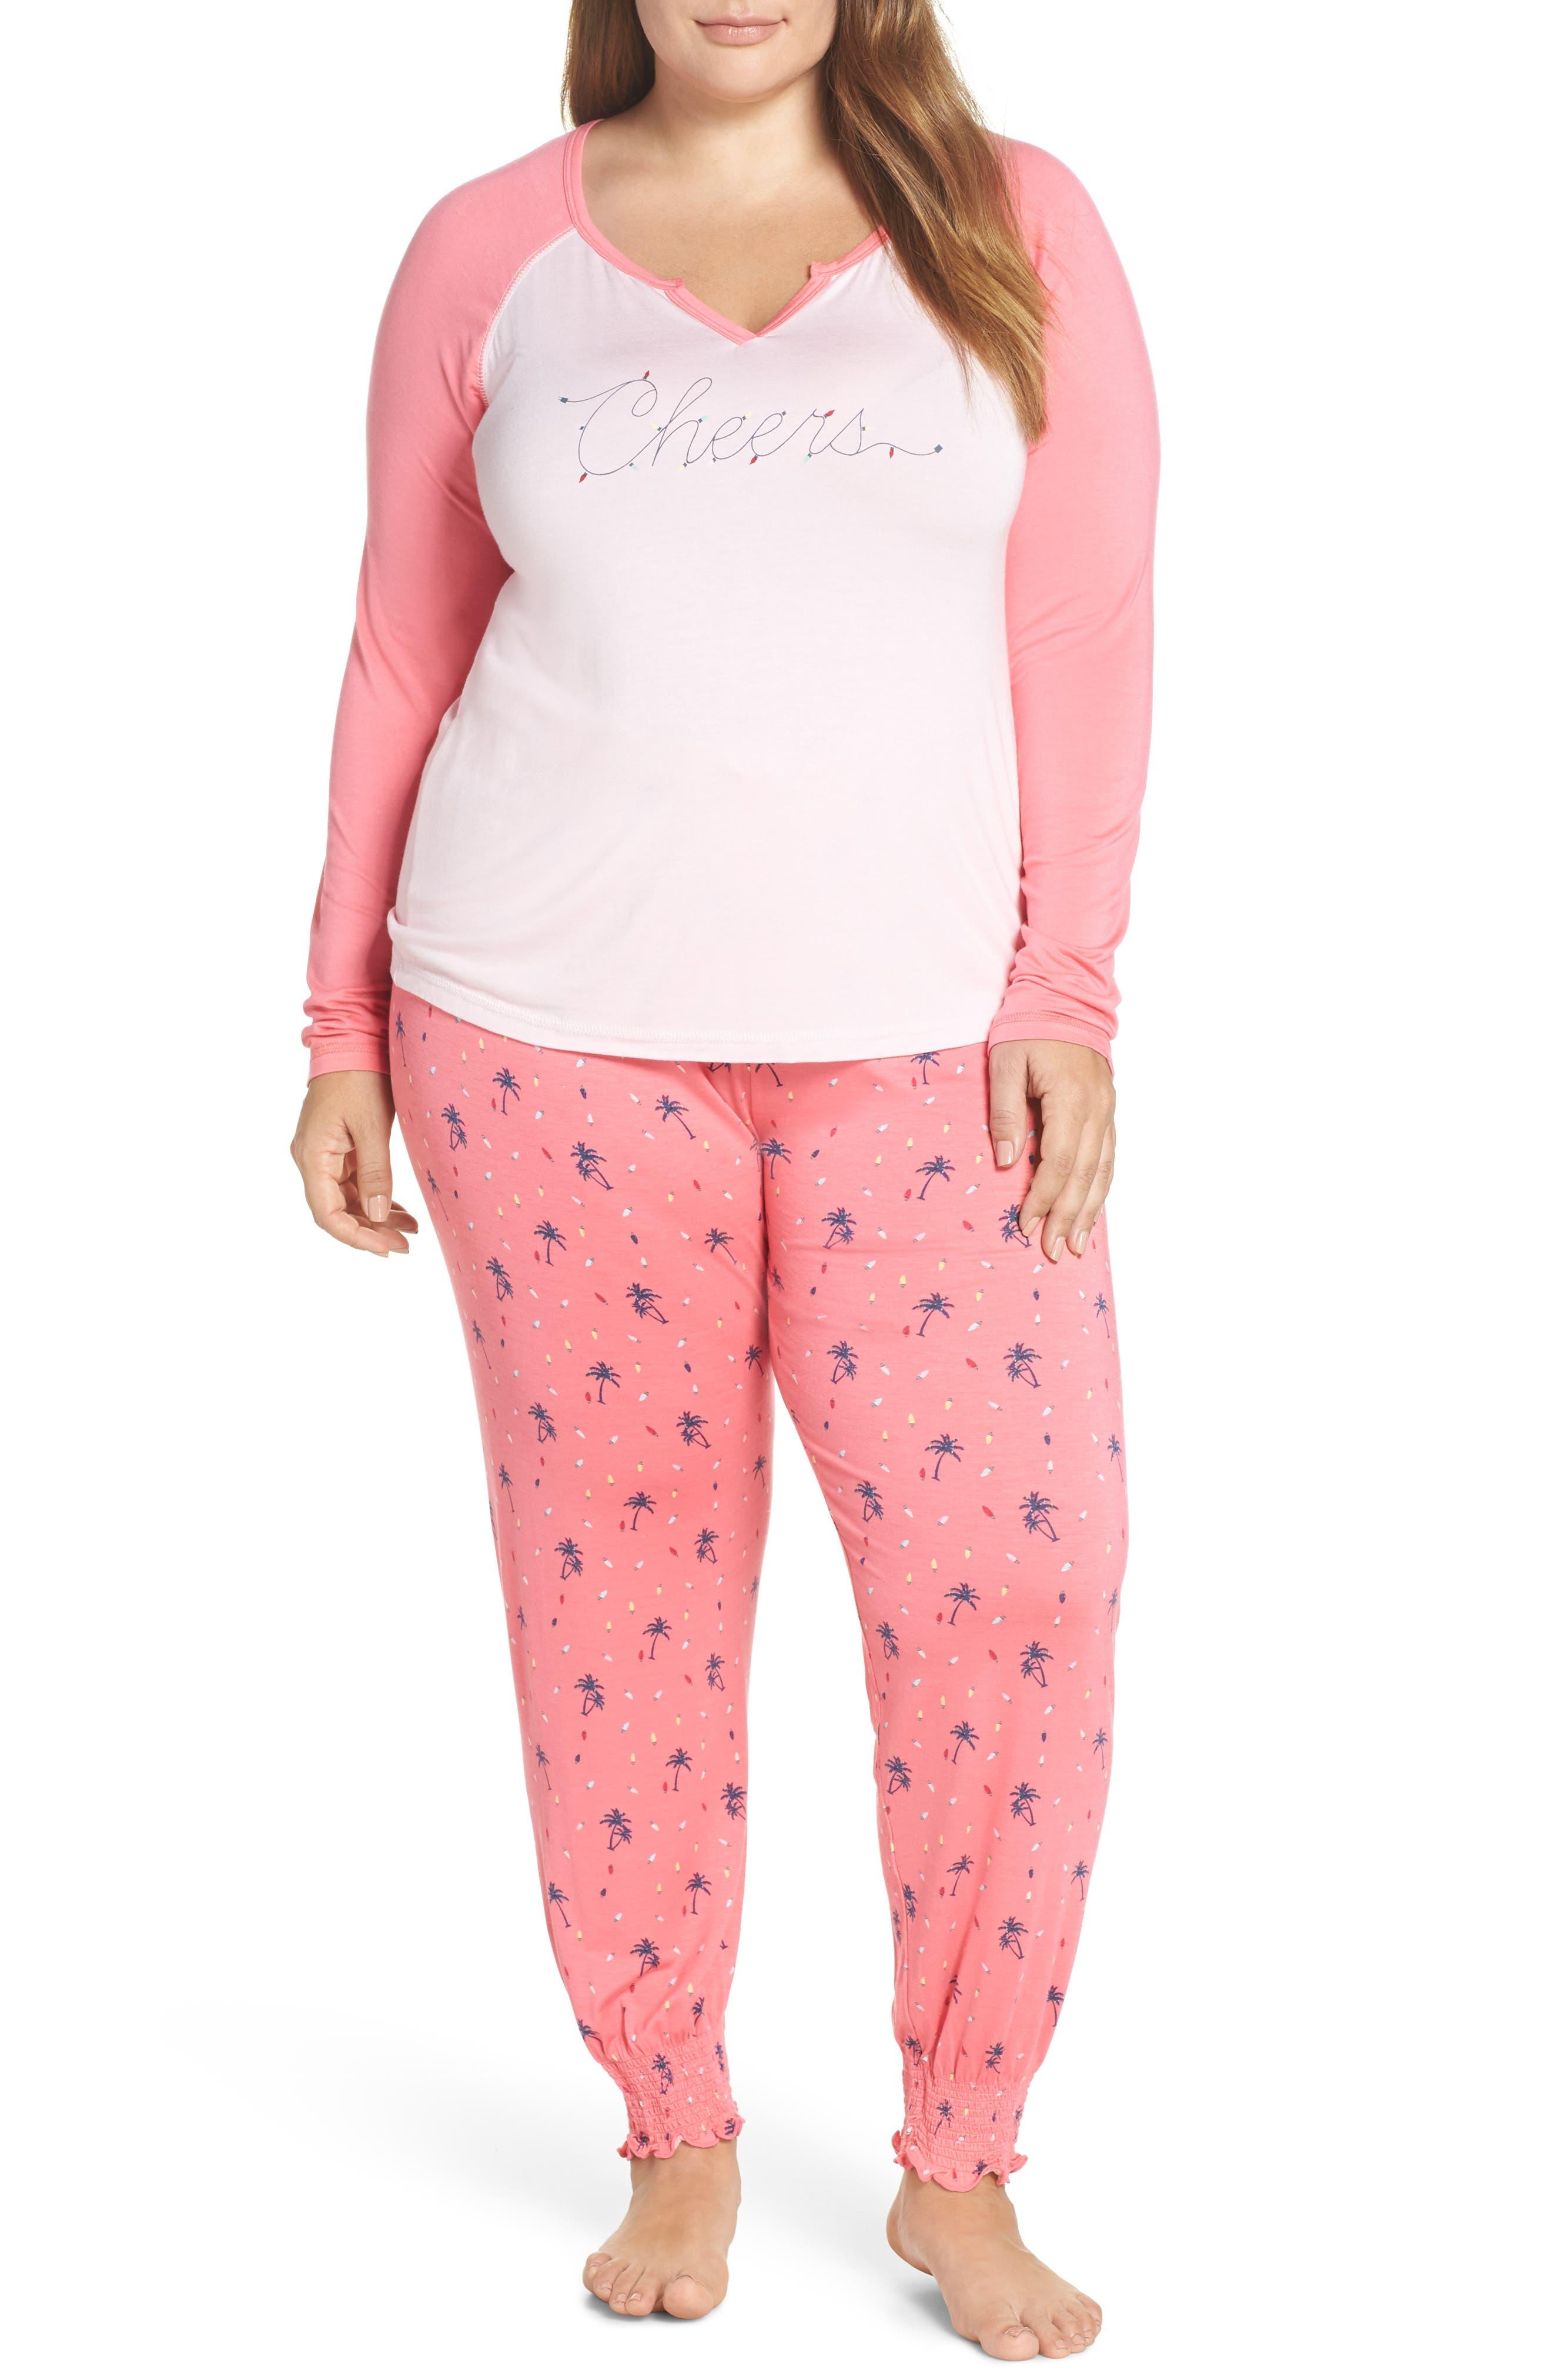 Womens Honeydew Intimates Winter Breaker Pajamas, Size Medium - Grey